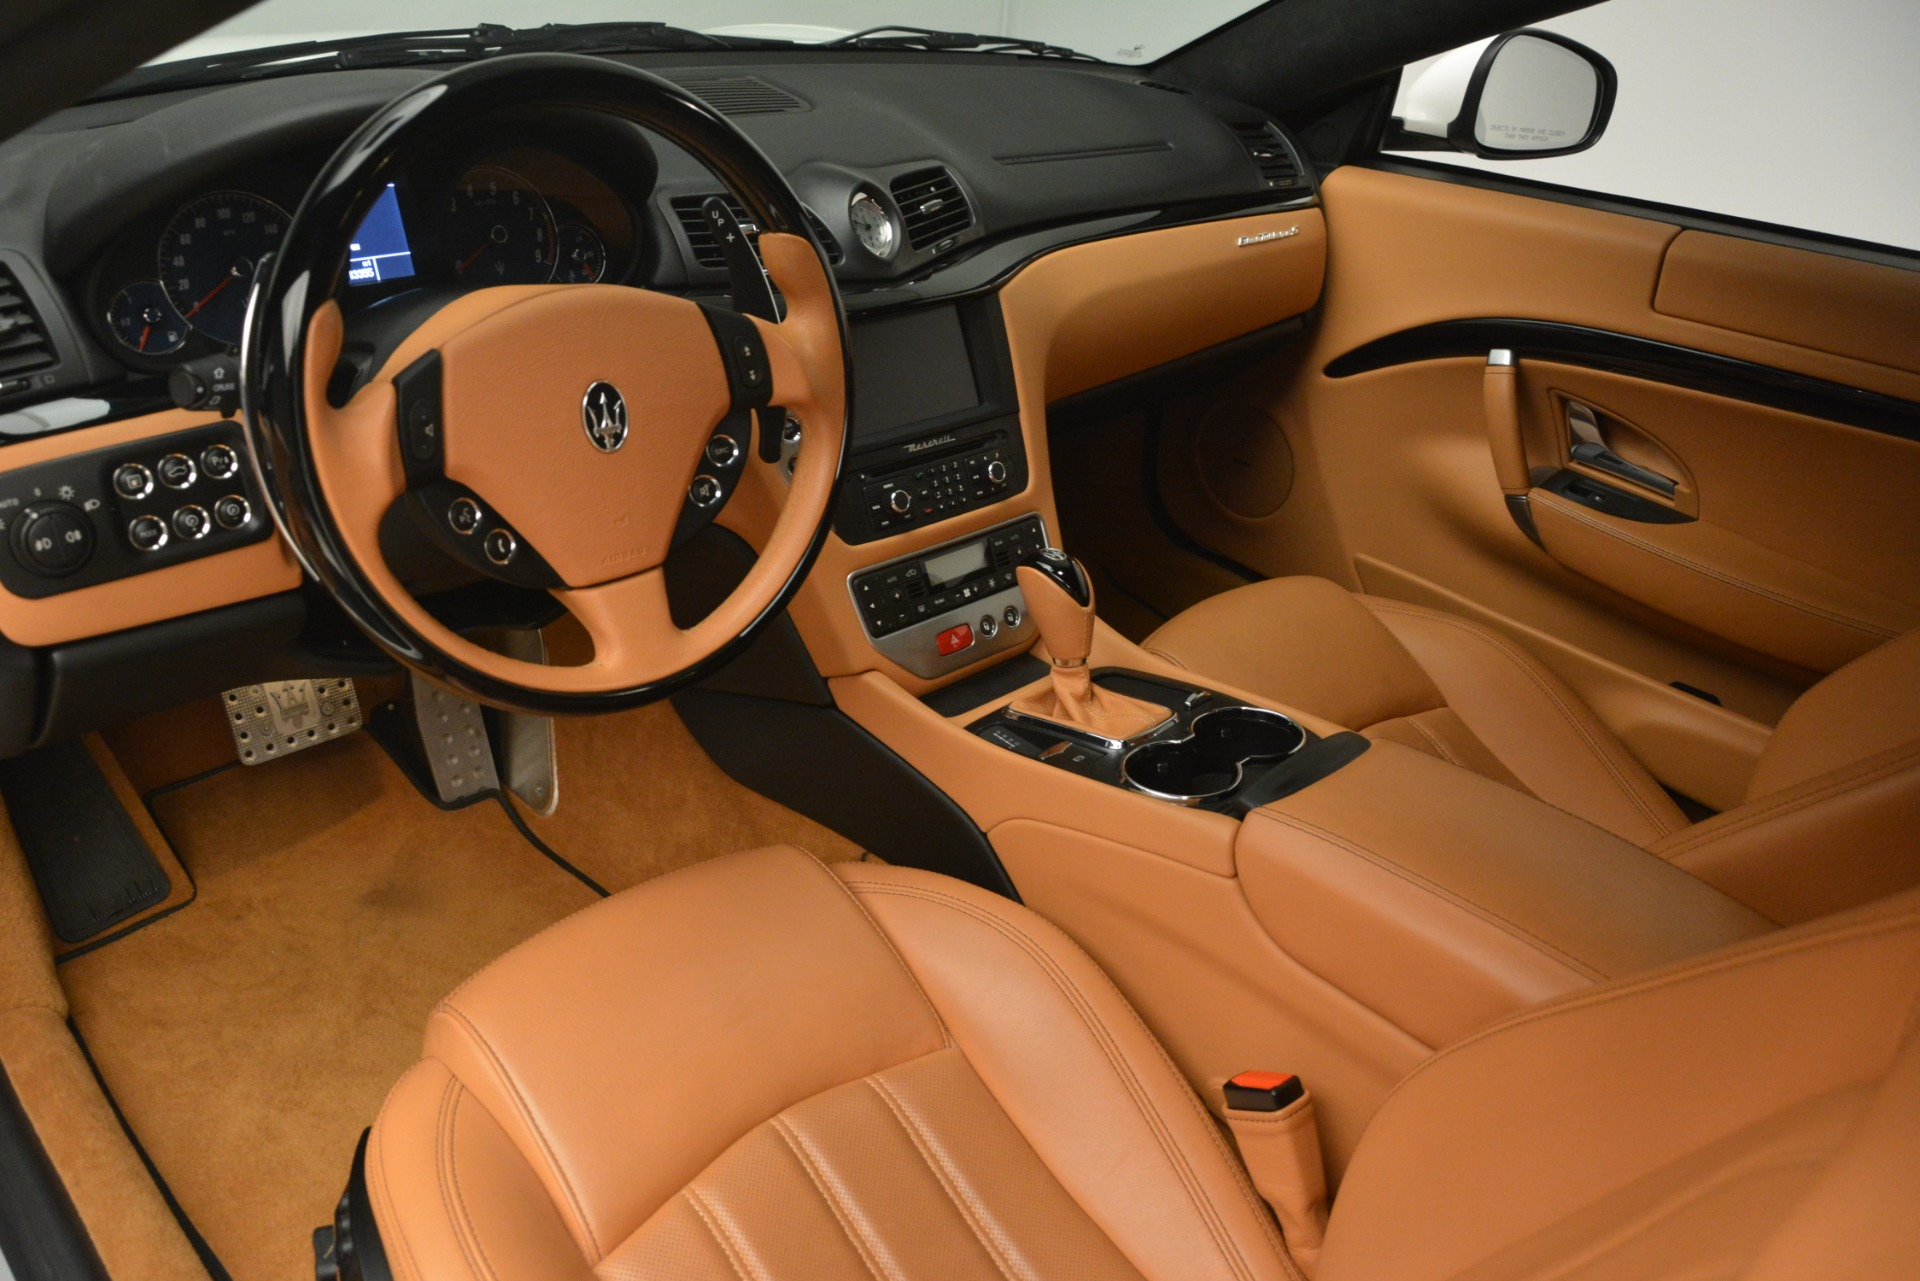 Used 2011 Maserati GranTurismo S Automatic For Sale In Westport, CT 3061_p13